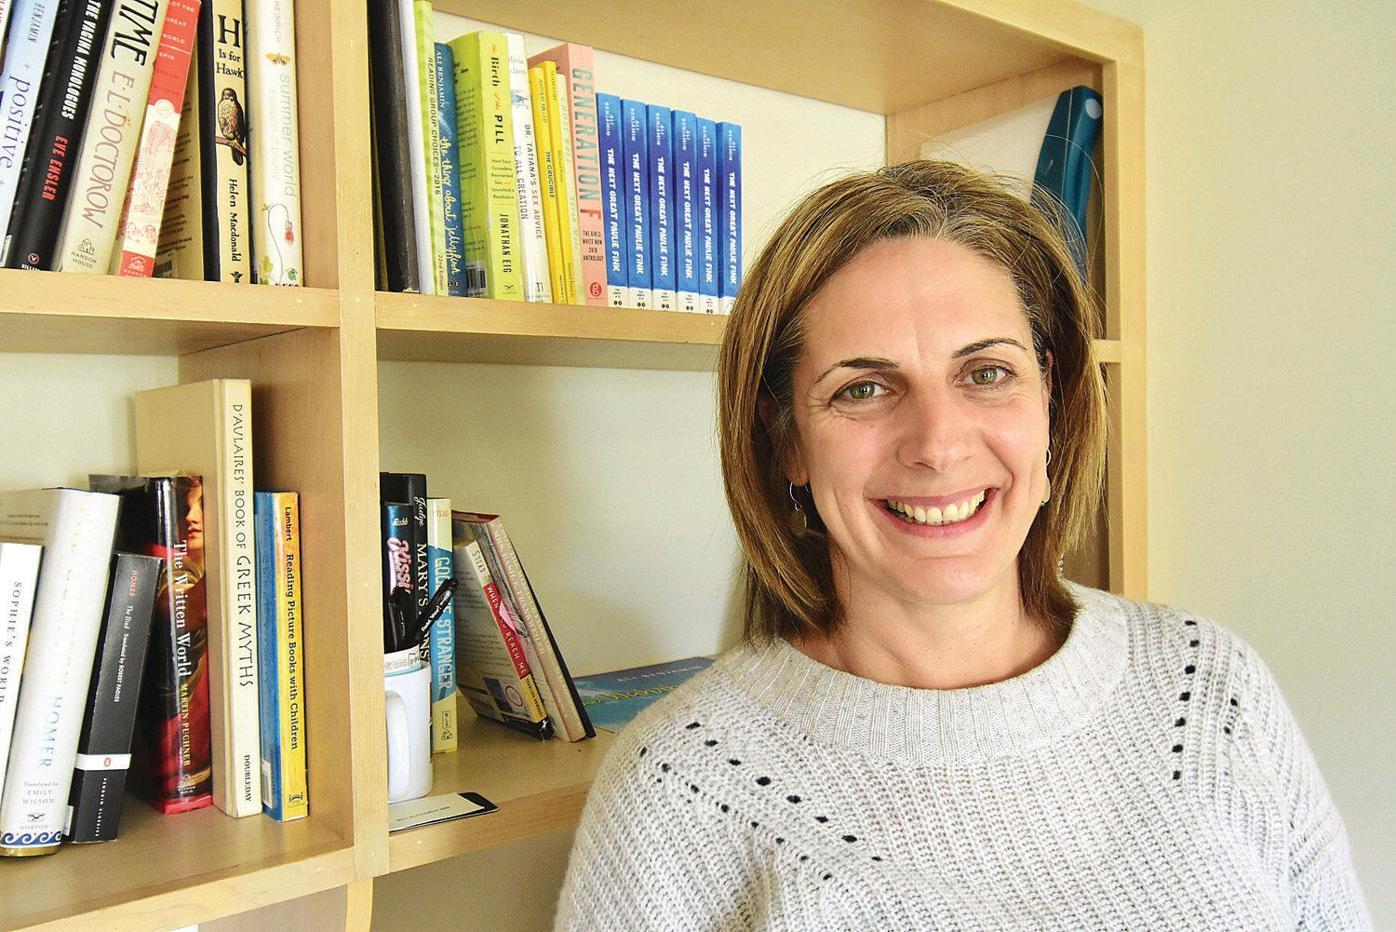 In new novel, National Book Award finalist Ali Benjamin reconsiders storytelling